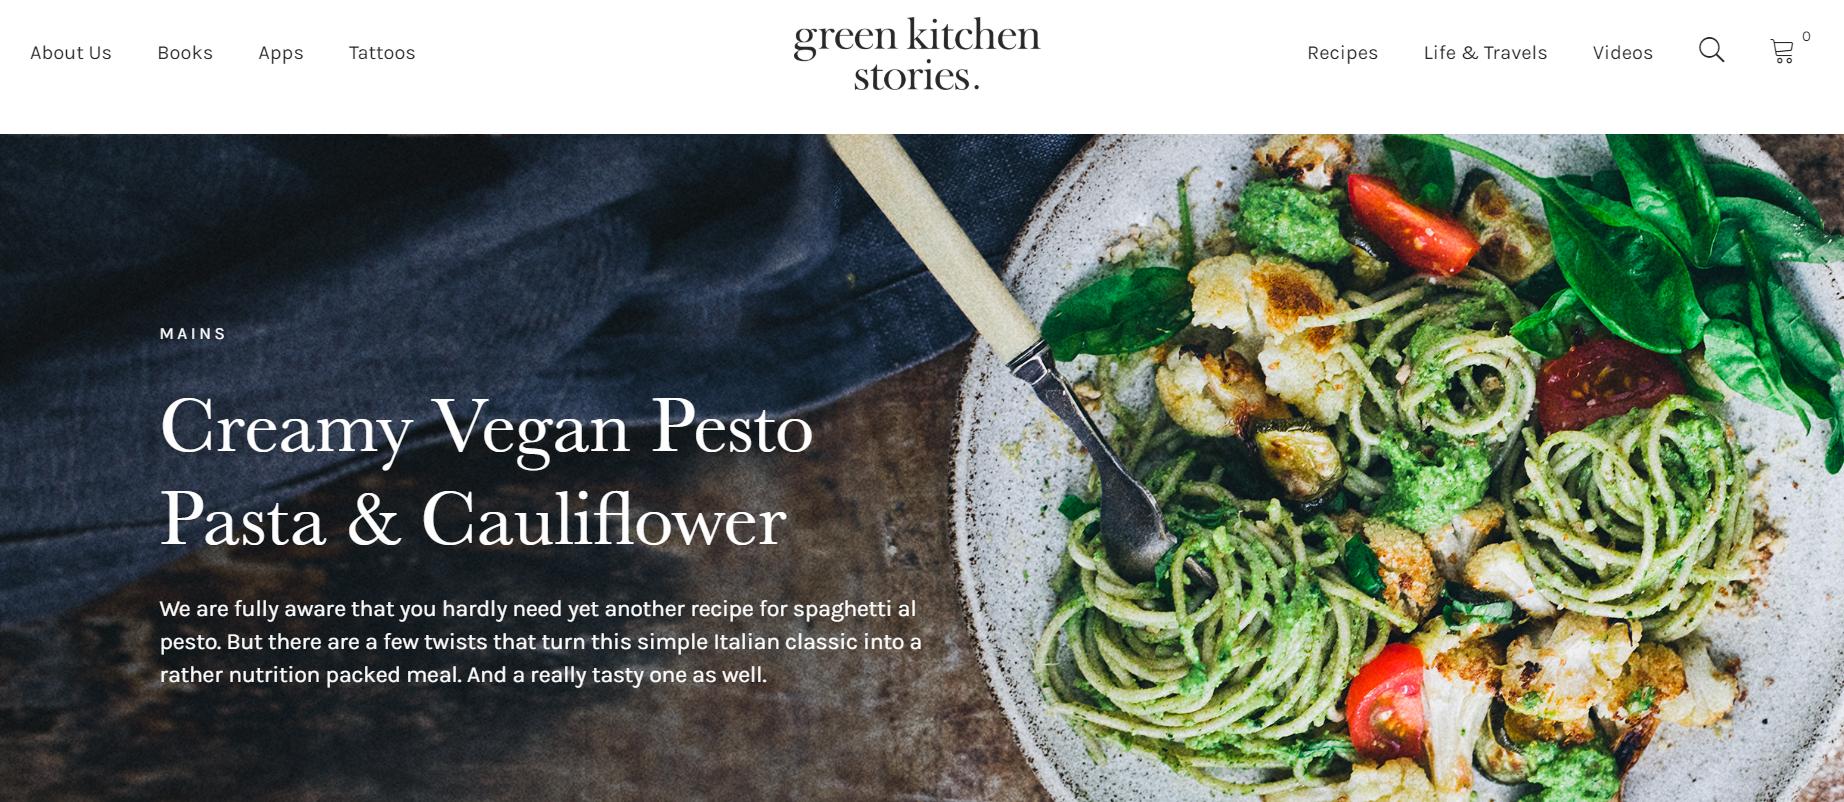 a green kitchen stories